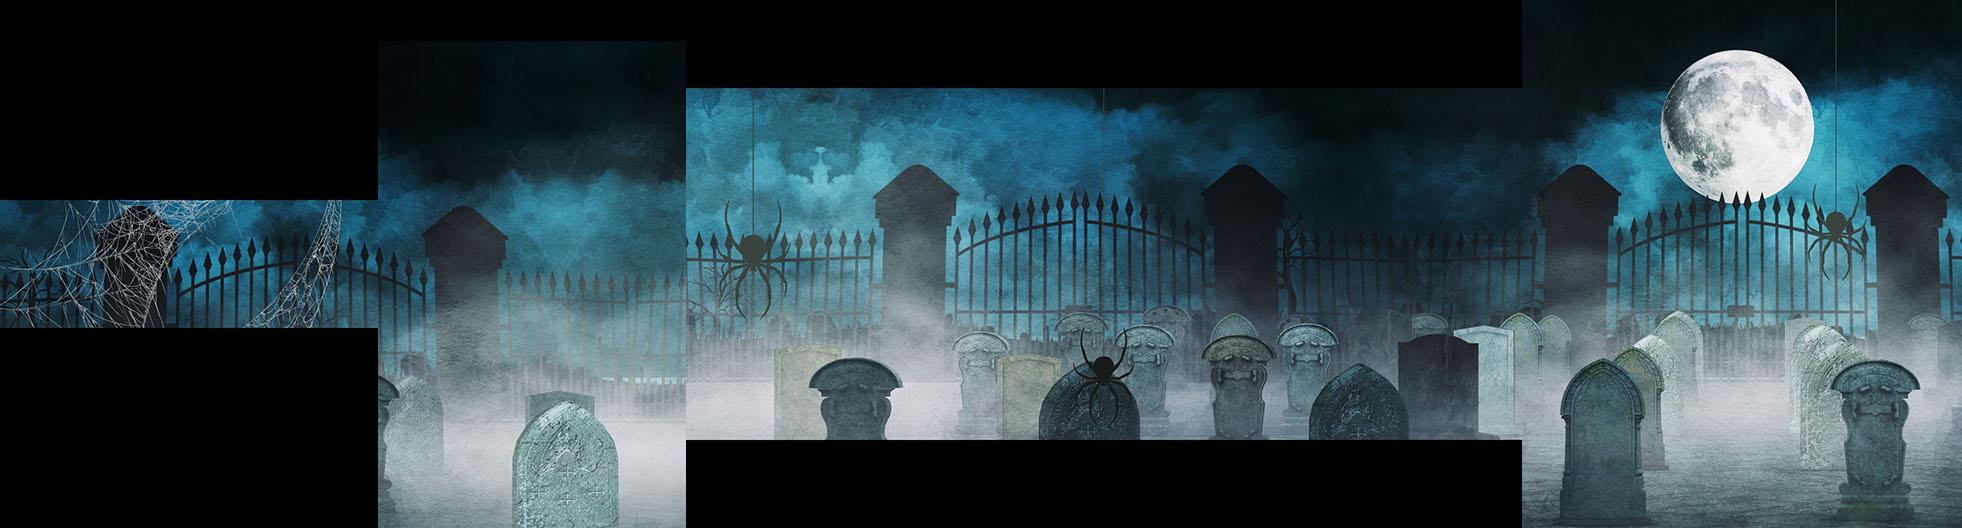 Graveyard - Got Talent Israel by Elad Magdasi